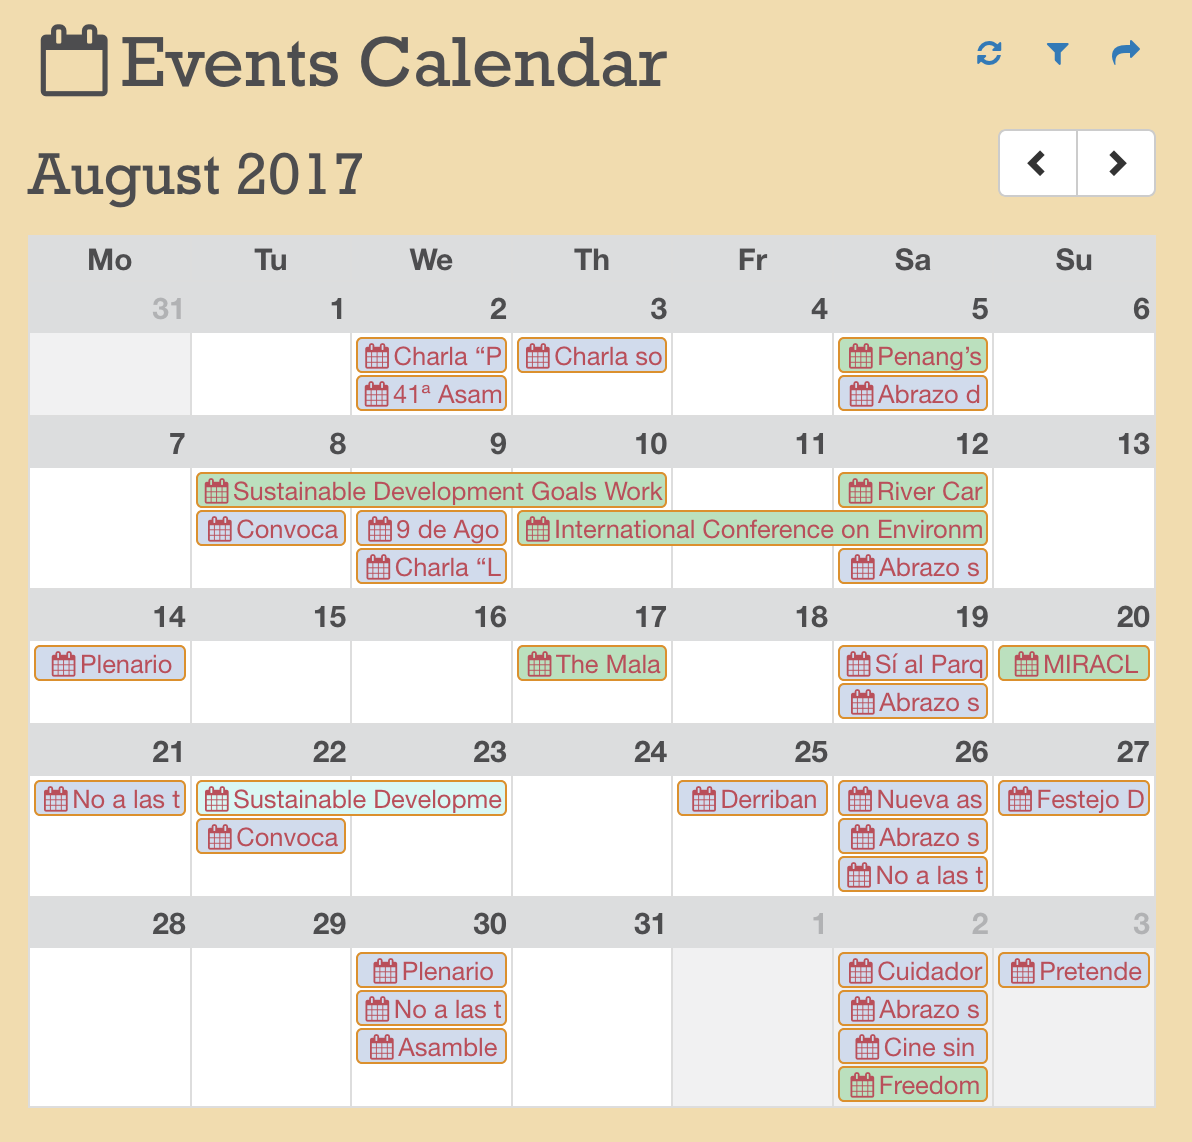 Multidomain events calendar